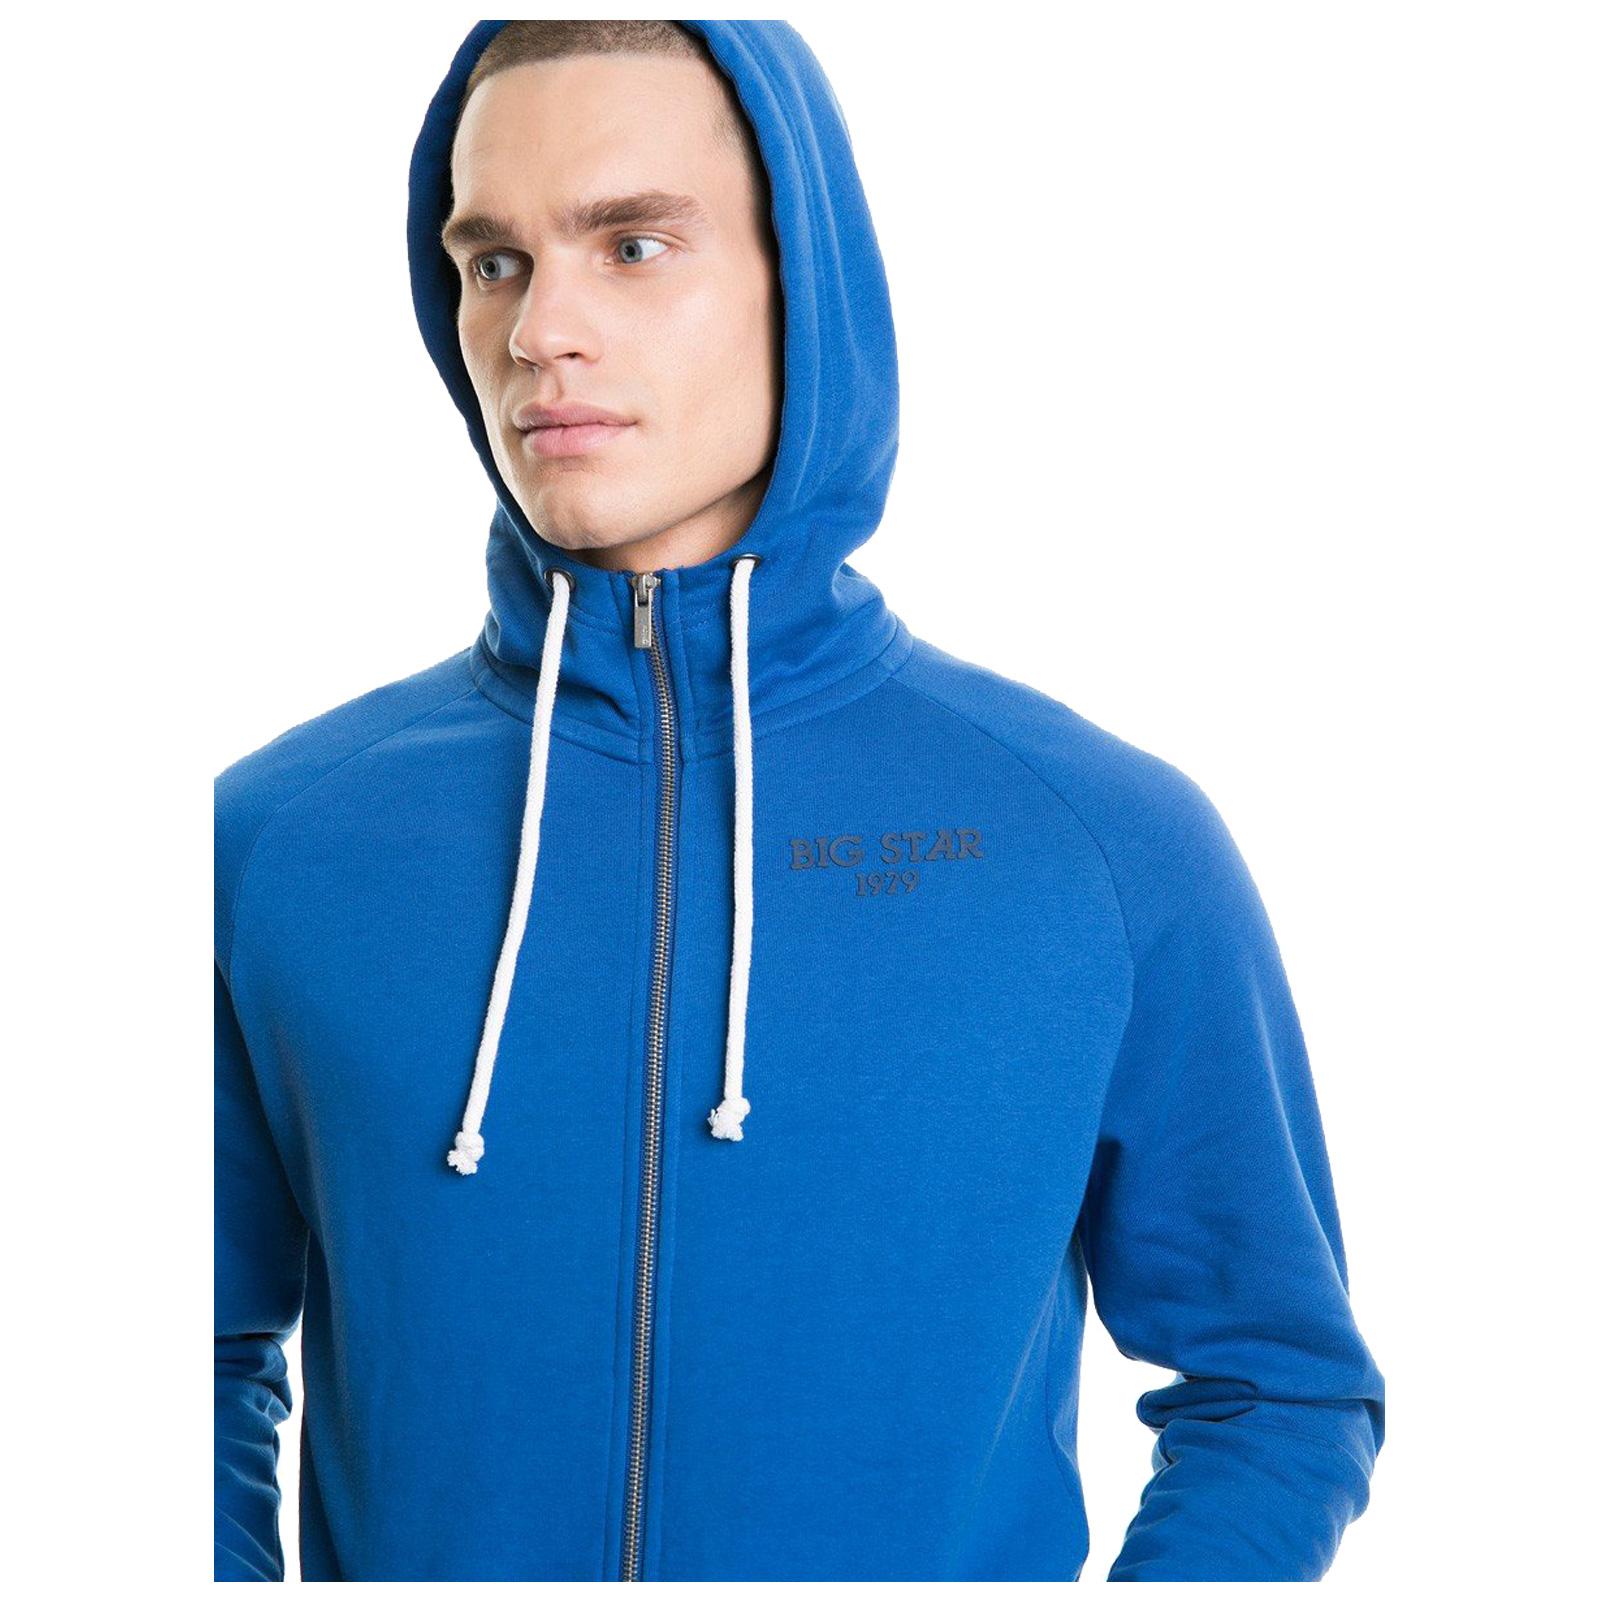 Big-Star-Mens-Hoodie-New-Cotton-Pullover-Full-Zip-Hooded-Casual-Sweatshirt thumbnail 10